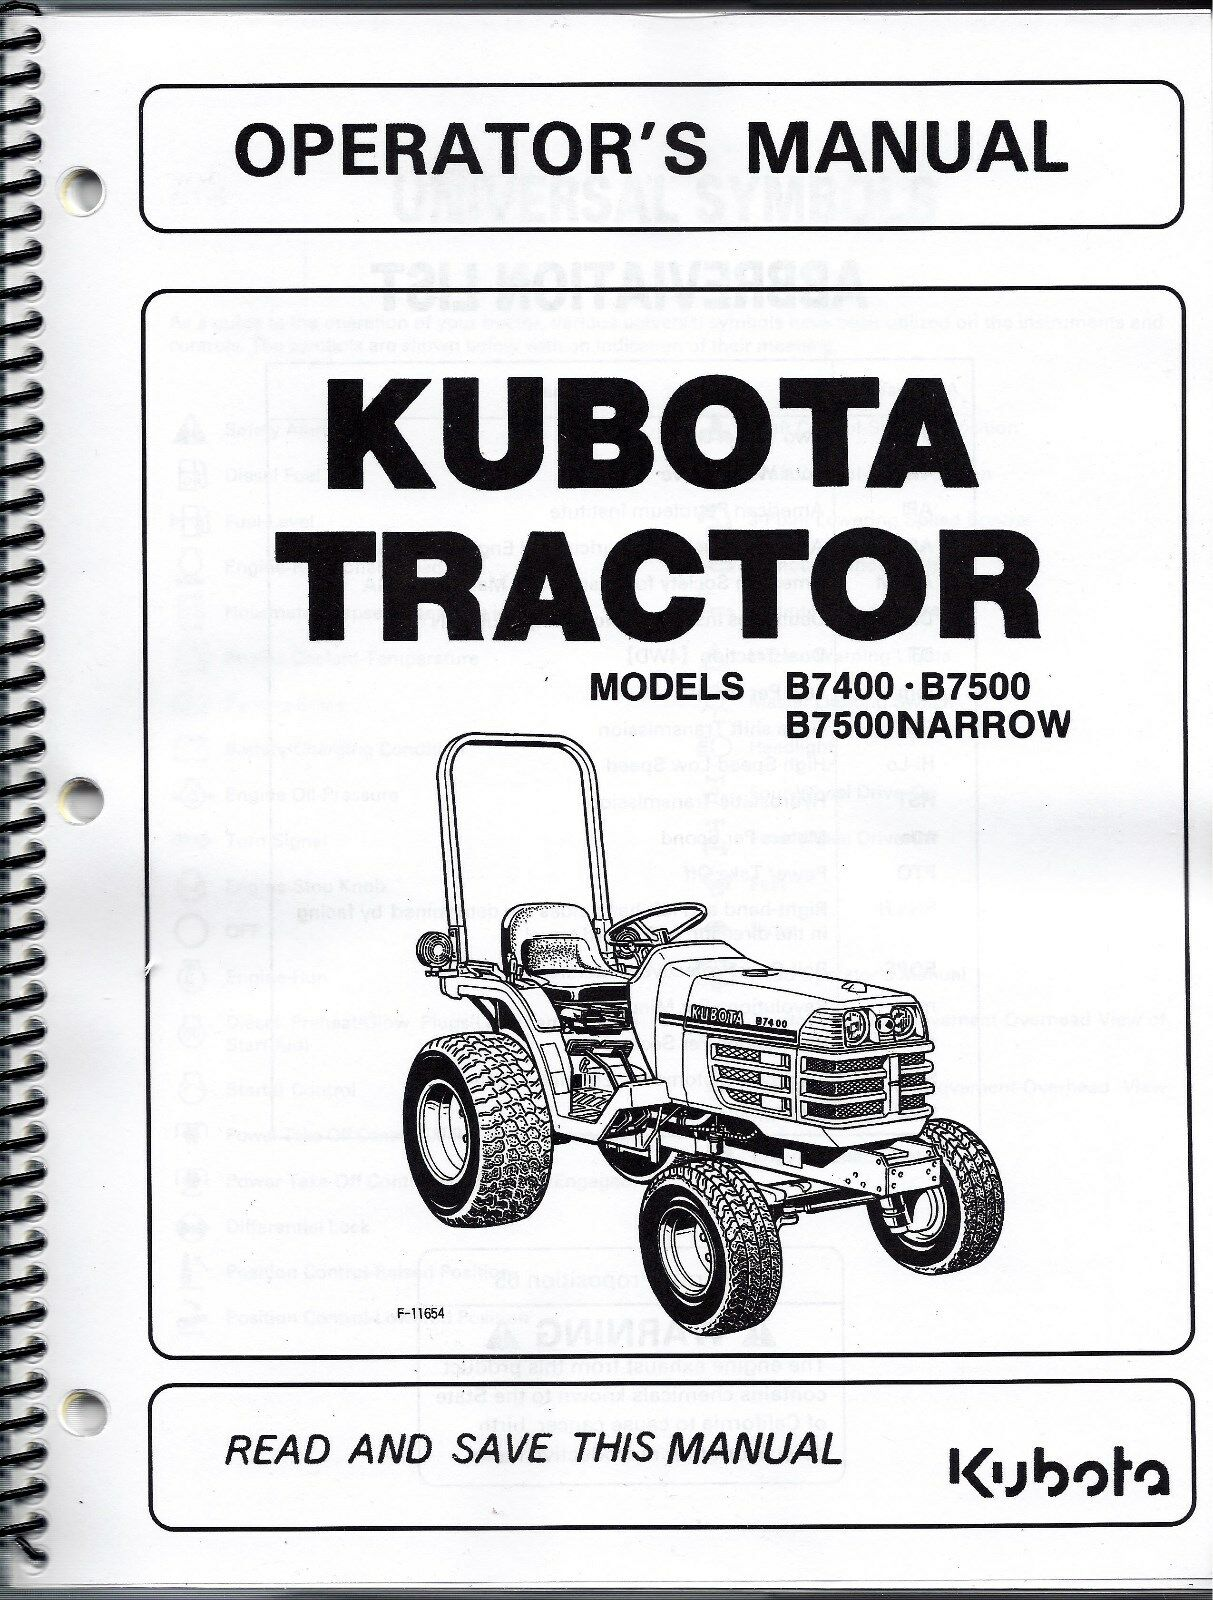 Kubota b7400 b7500 tractor operator manual 6c120 63113 ebay resntentobalflowflowcomponenttechnicalissues pooptronica Images